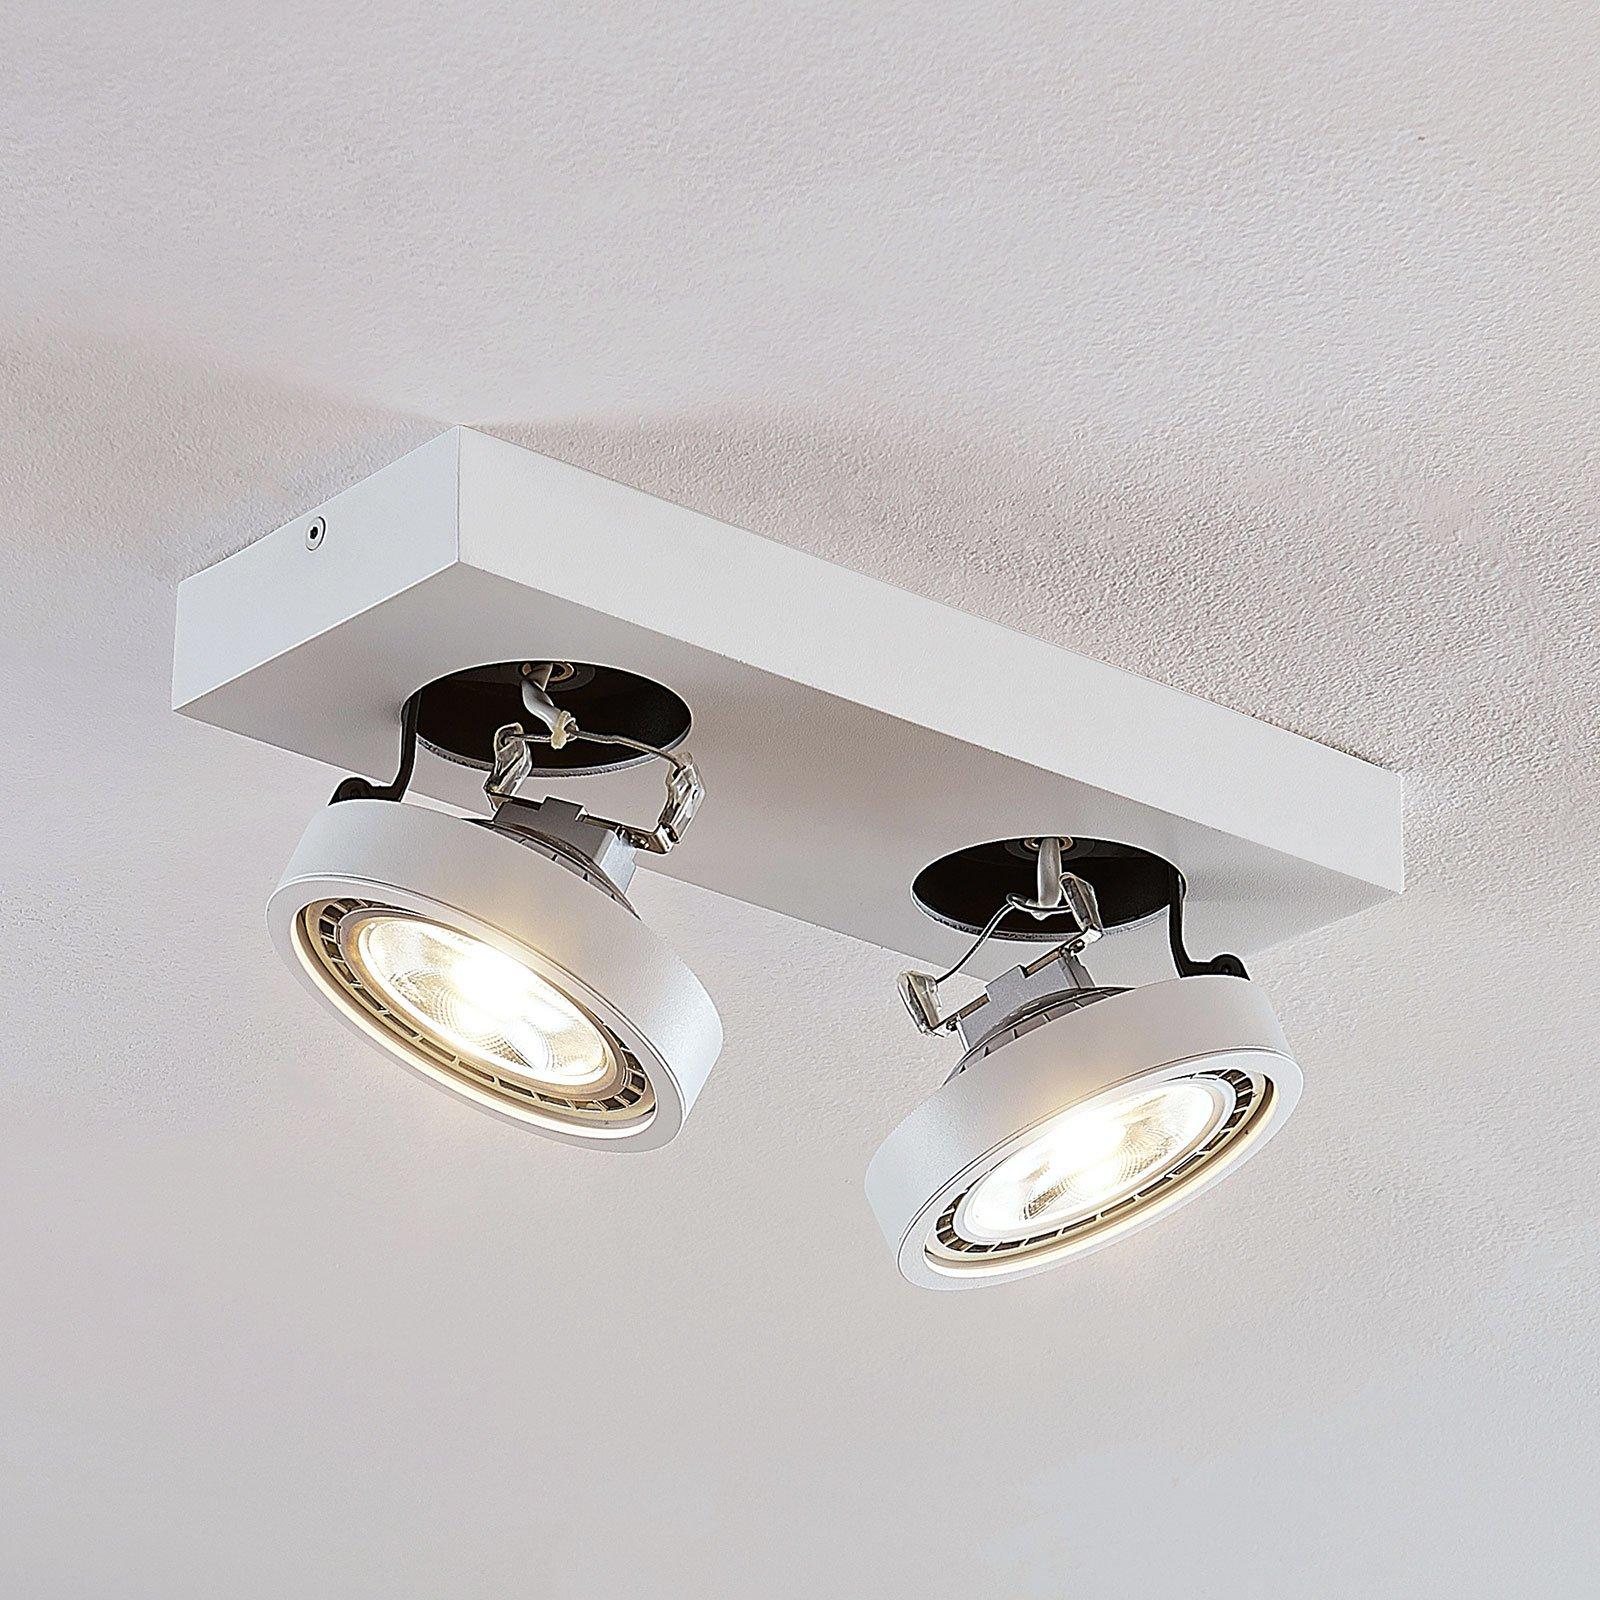 LED-taklampe Negan i hvit, 2 lyskilder